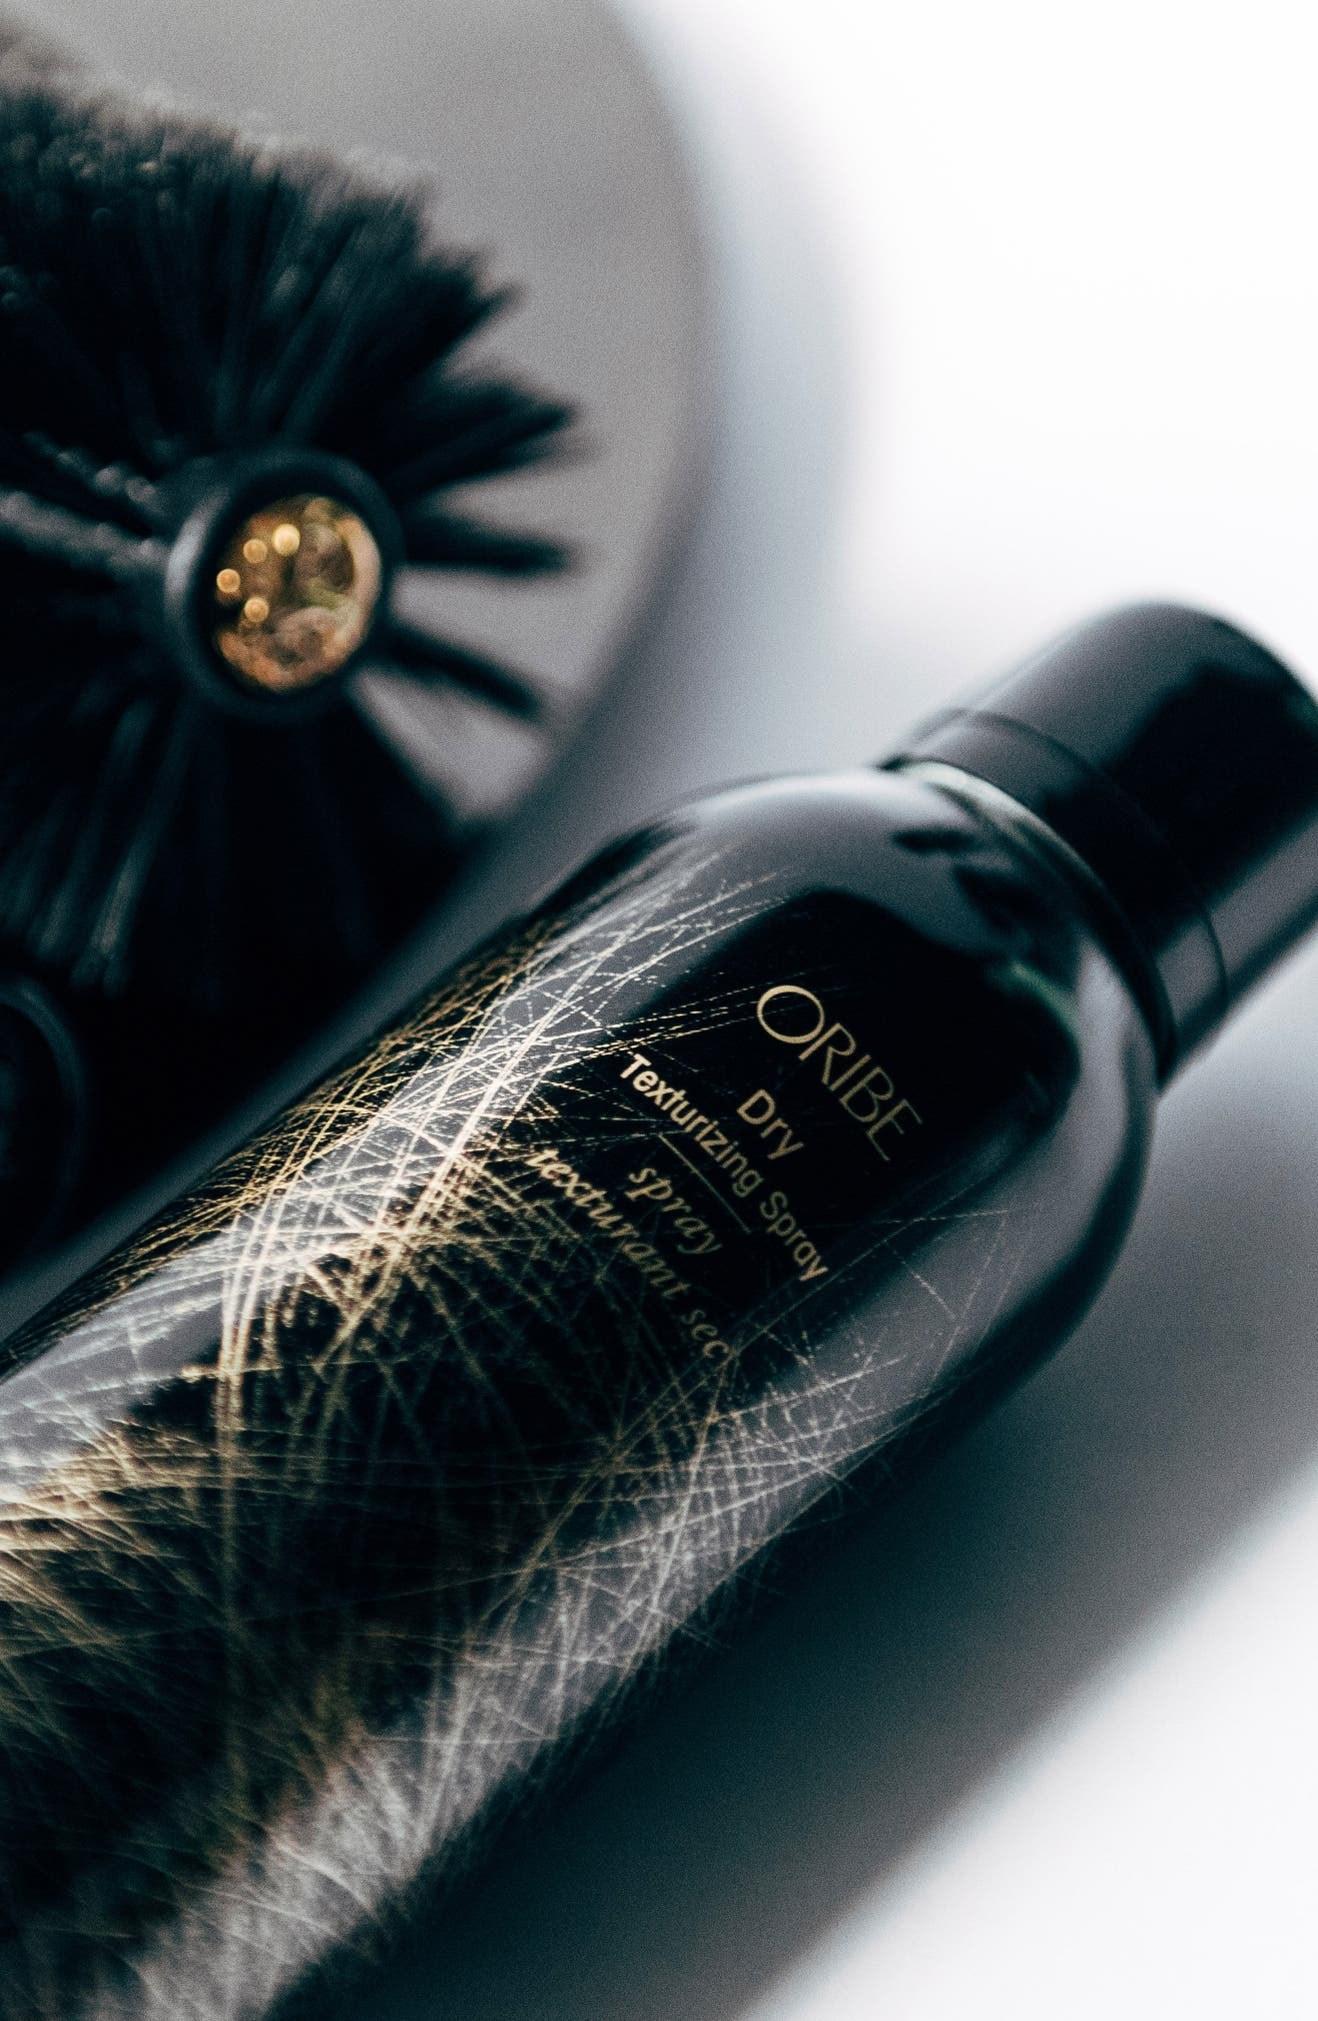 The black shampoo spray bottle